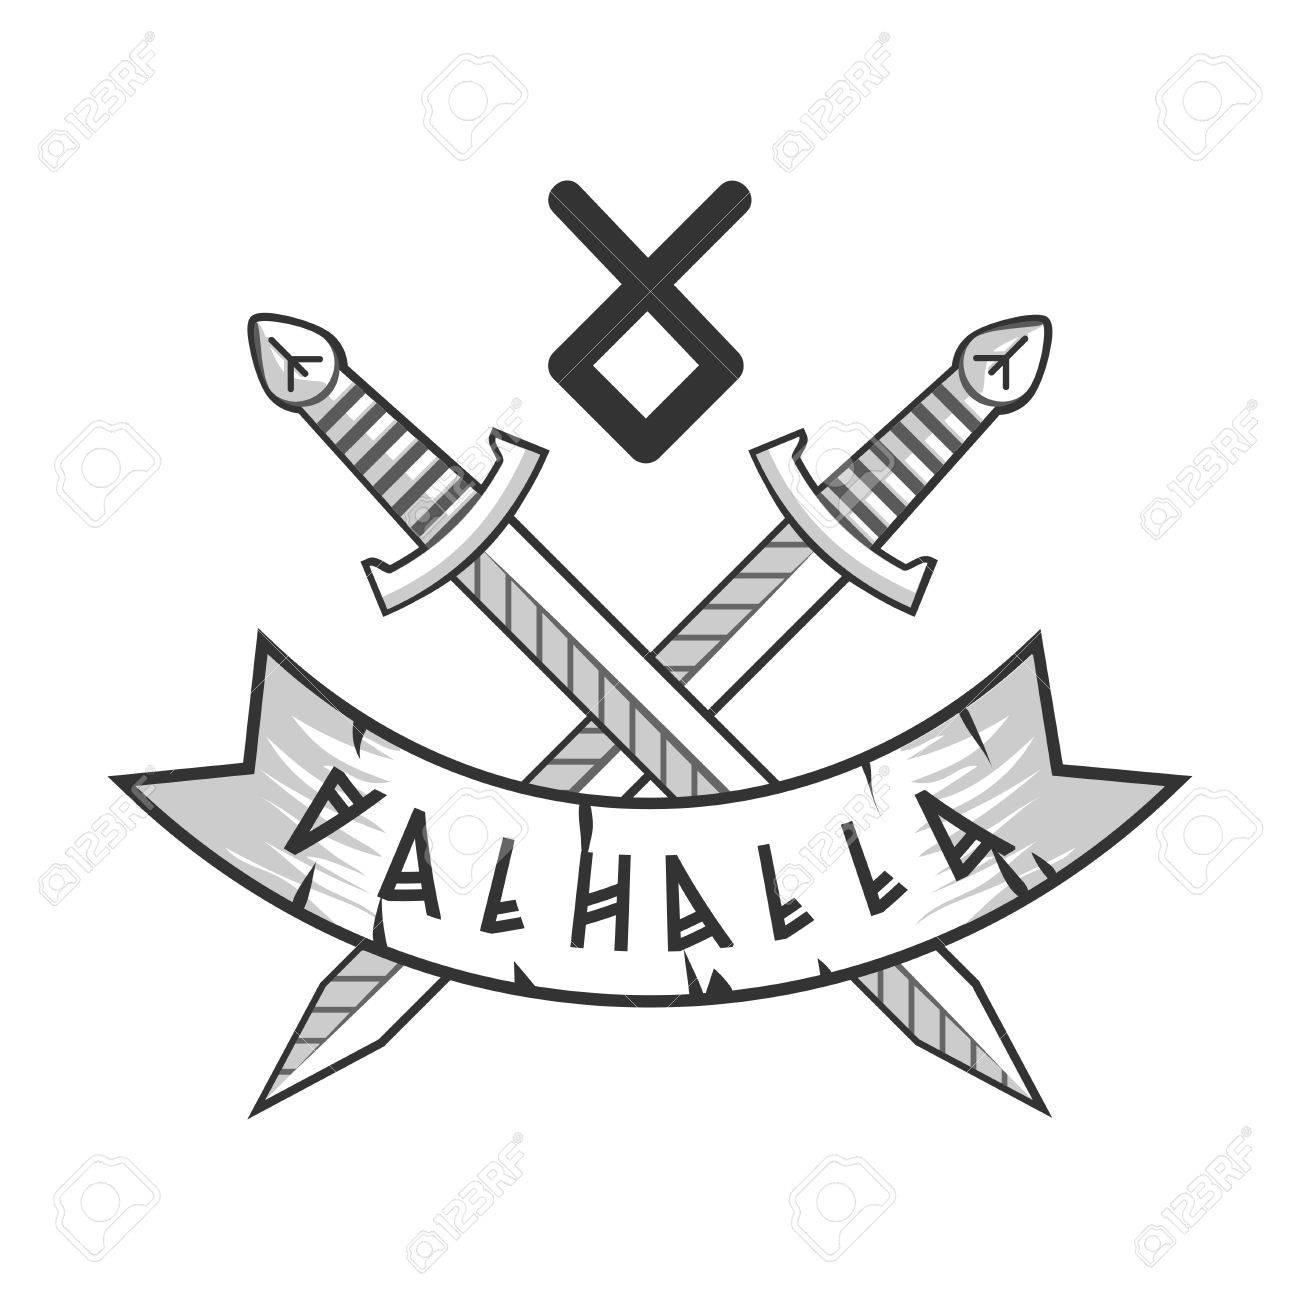 Valhalla clipart clip royalty free Valhalla Clipart & Free Clip Art Images #36470 ... clip royalty free